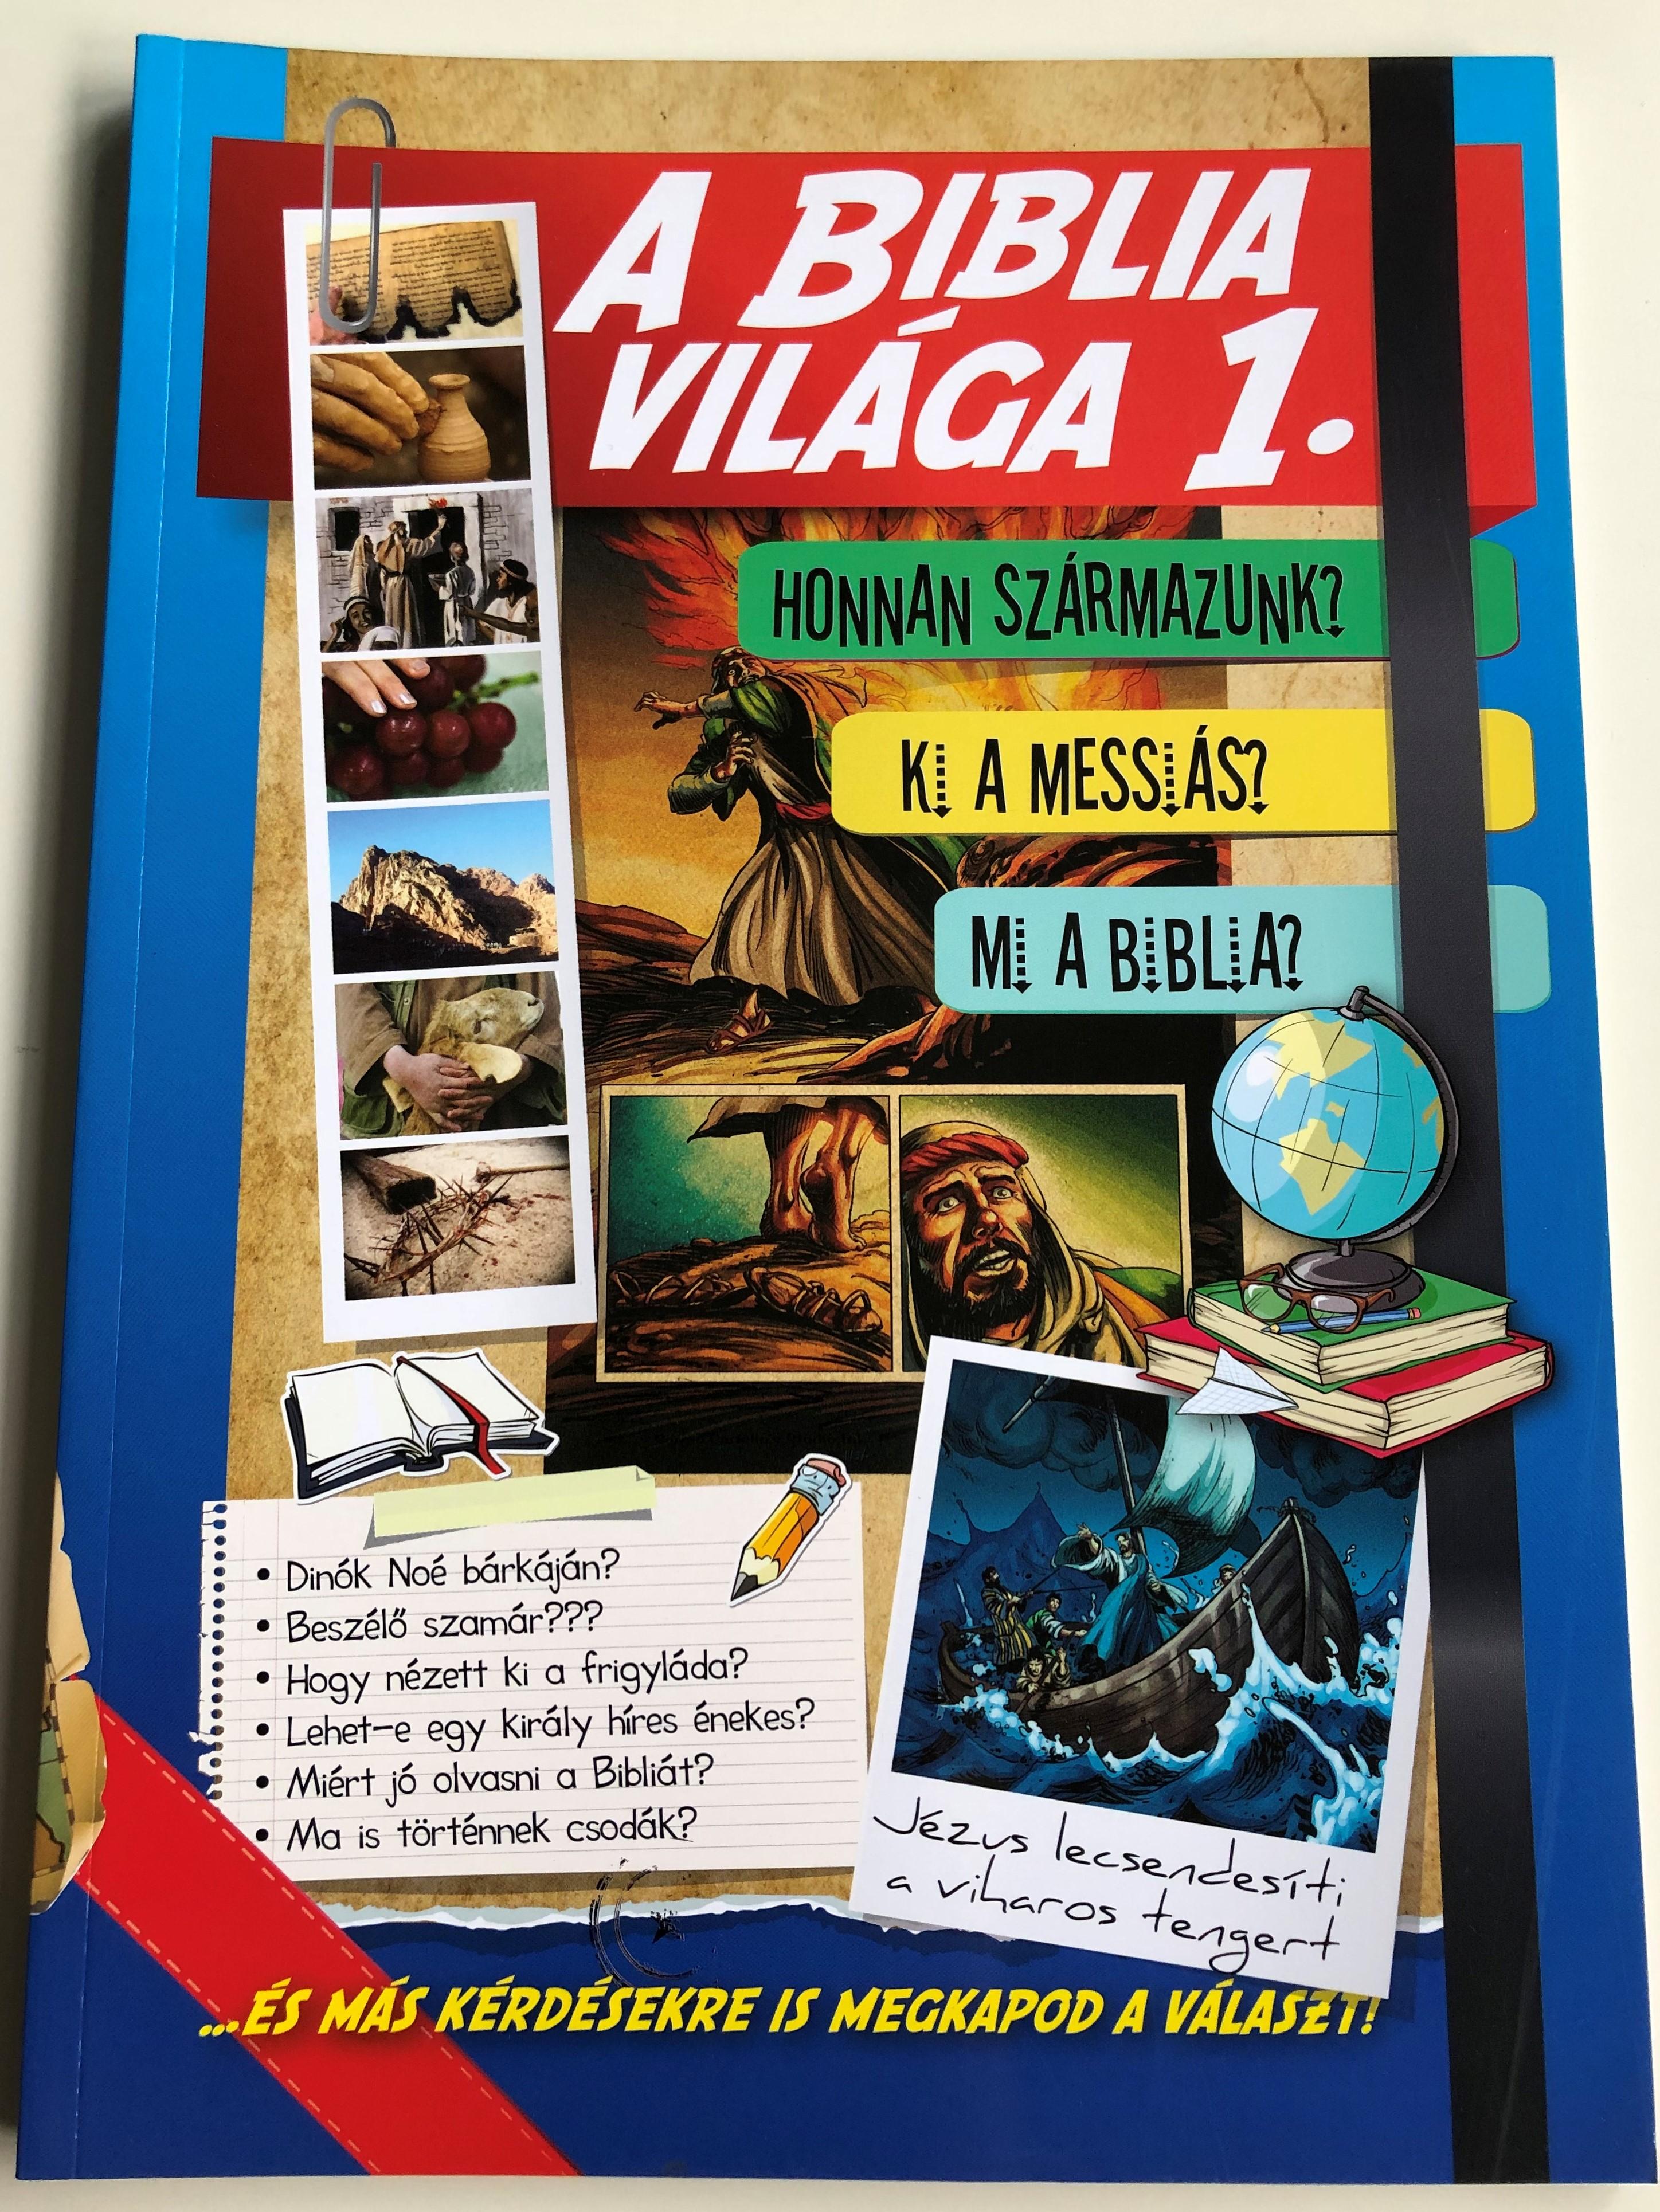 -a-biblia-vil-ga-1.-by-csalog-eszter-gr-ll-tibor-hack-m-rta-the-world-of-the-bible-1.jpg